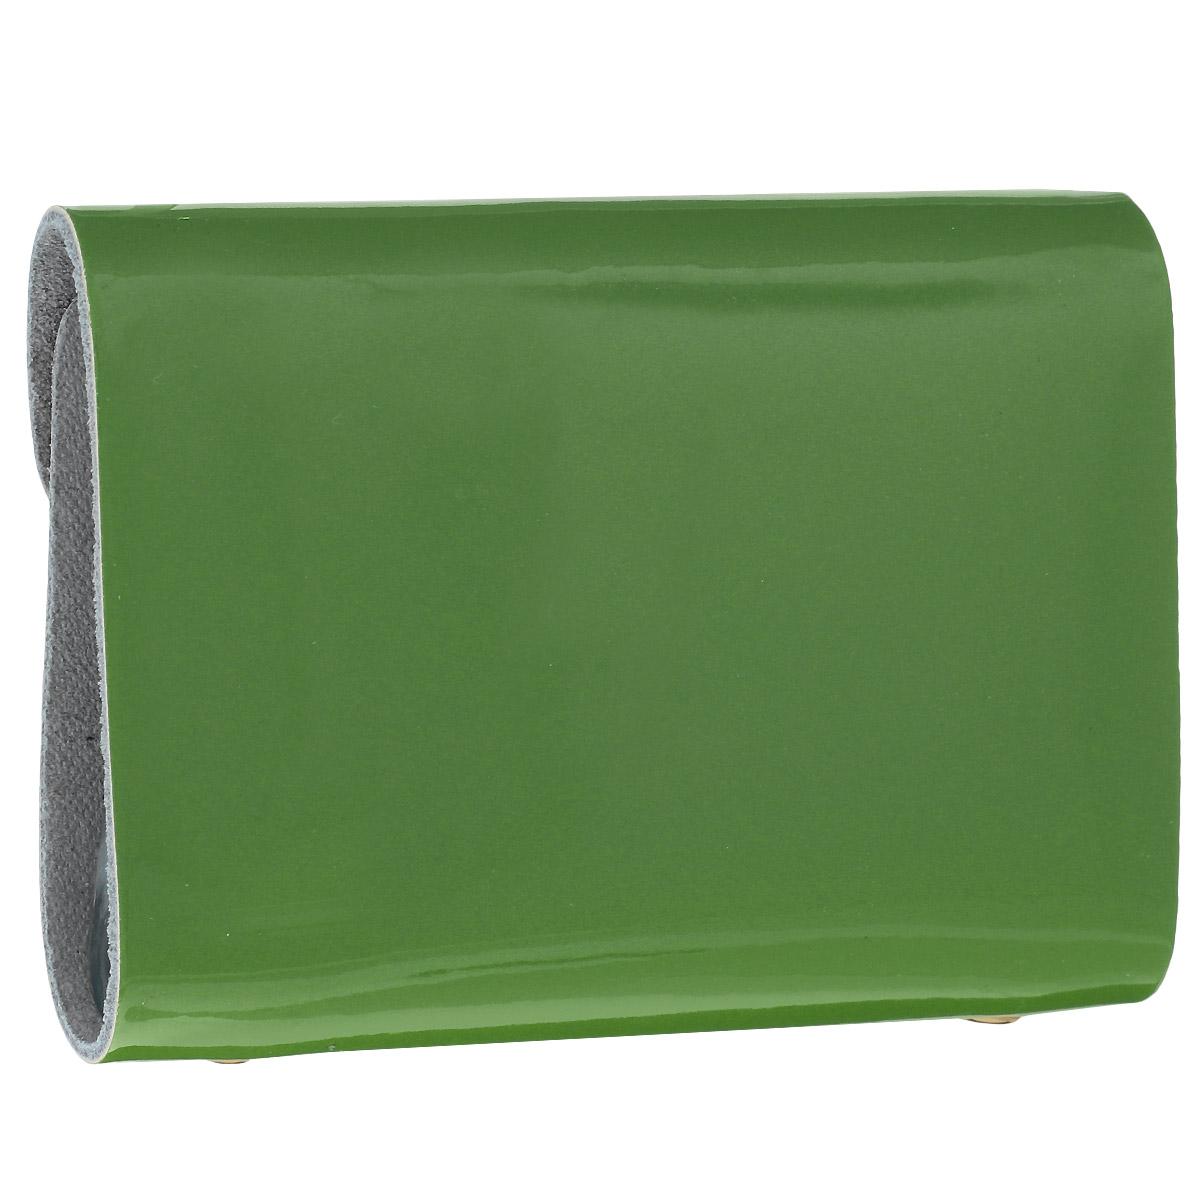 "Визитница ""Cheribags"", цвет: зелёный. V-0494-14 ( V-0494-14 )"